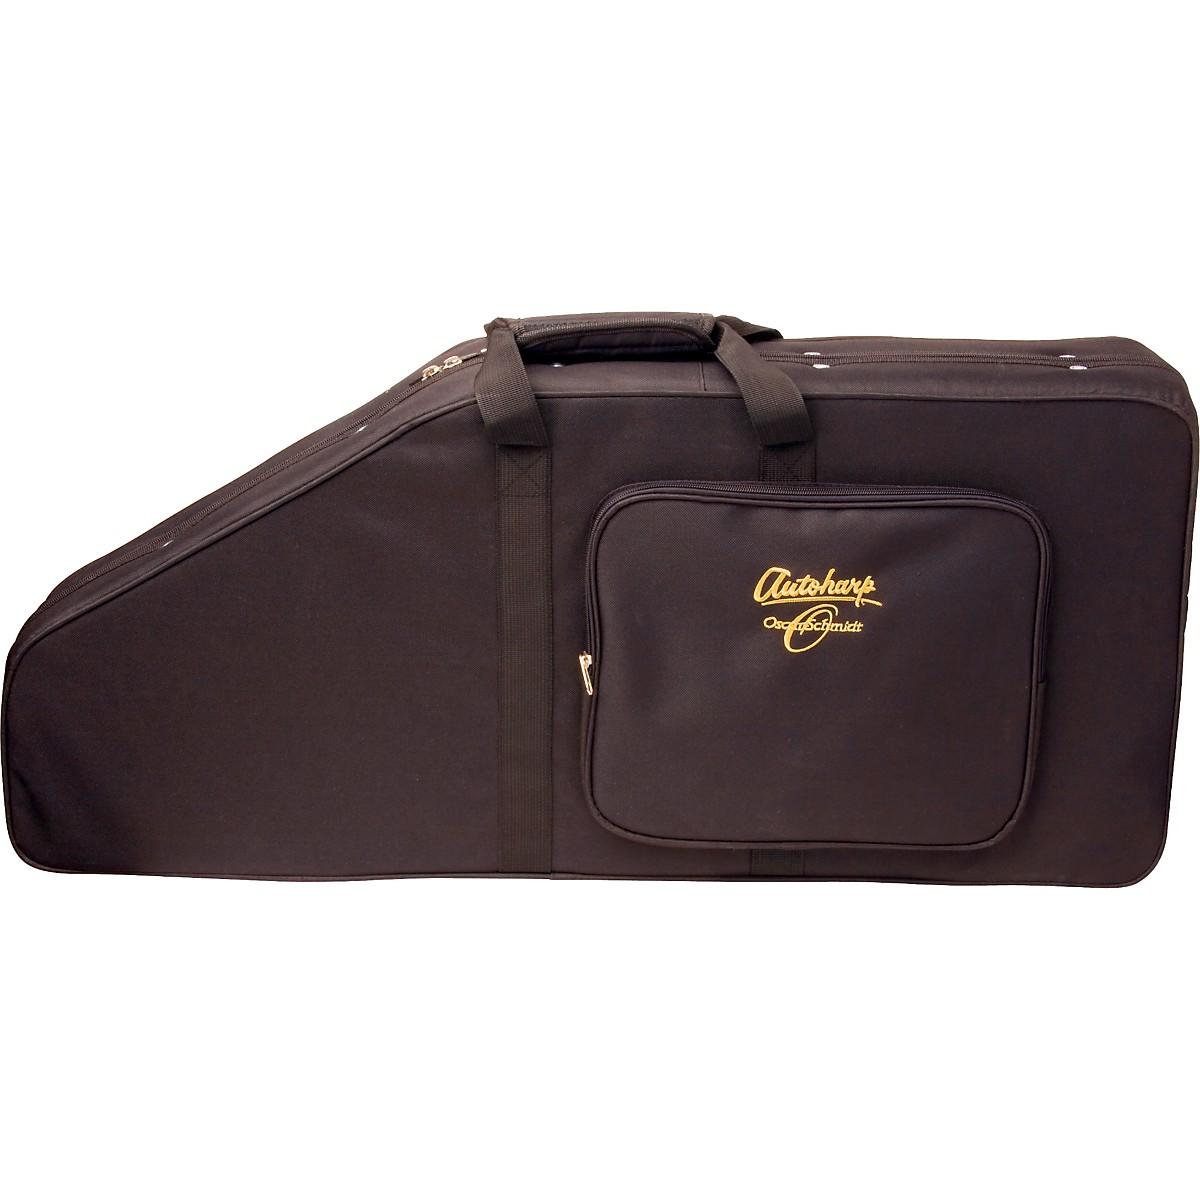 Oscar Schmidt Autoharp Semi-Hardshell Backpack Case